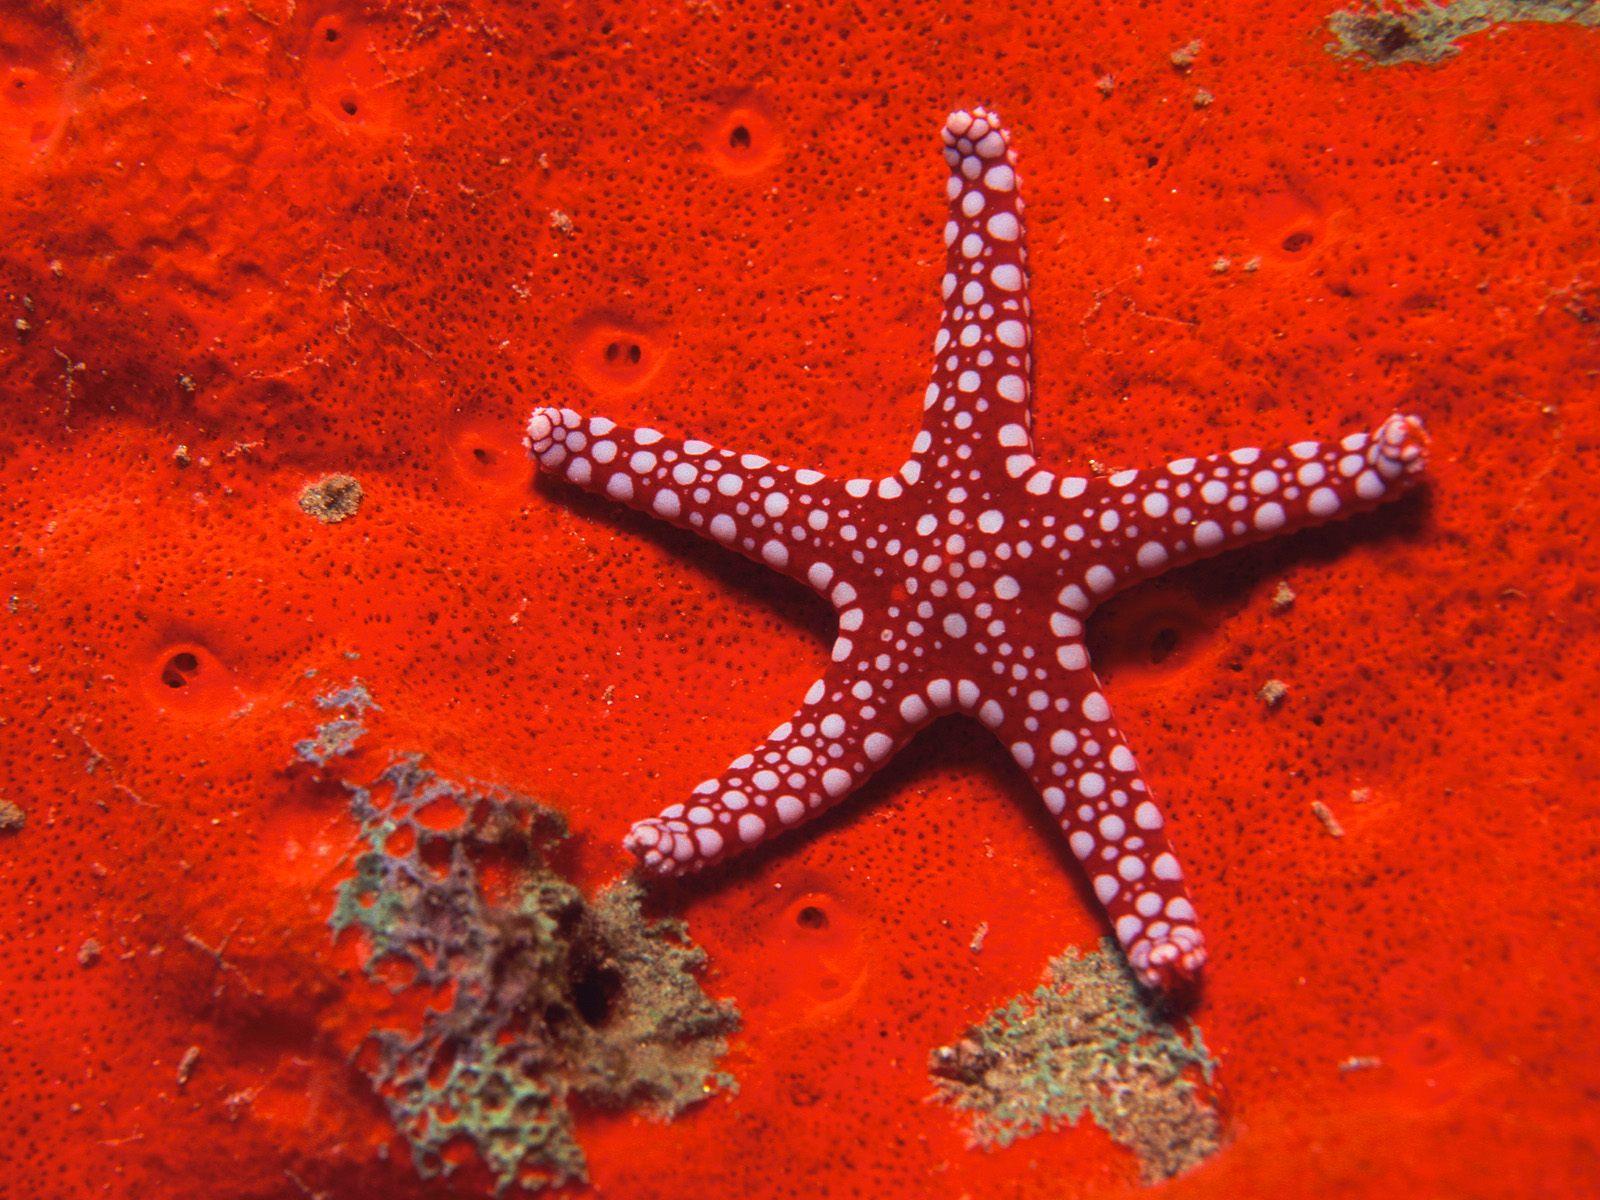 http://2.bp.blogspot.com/_RKDu4pqM0bQ/TVBFAcV0C1I/AAAAAAAAADY/0hK4bpeX_Ng/s1600/Red+starfish.jpg